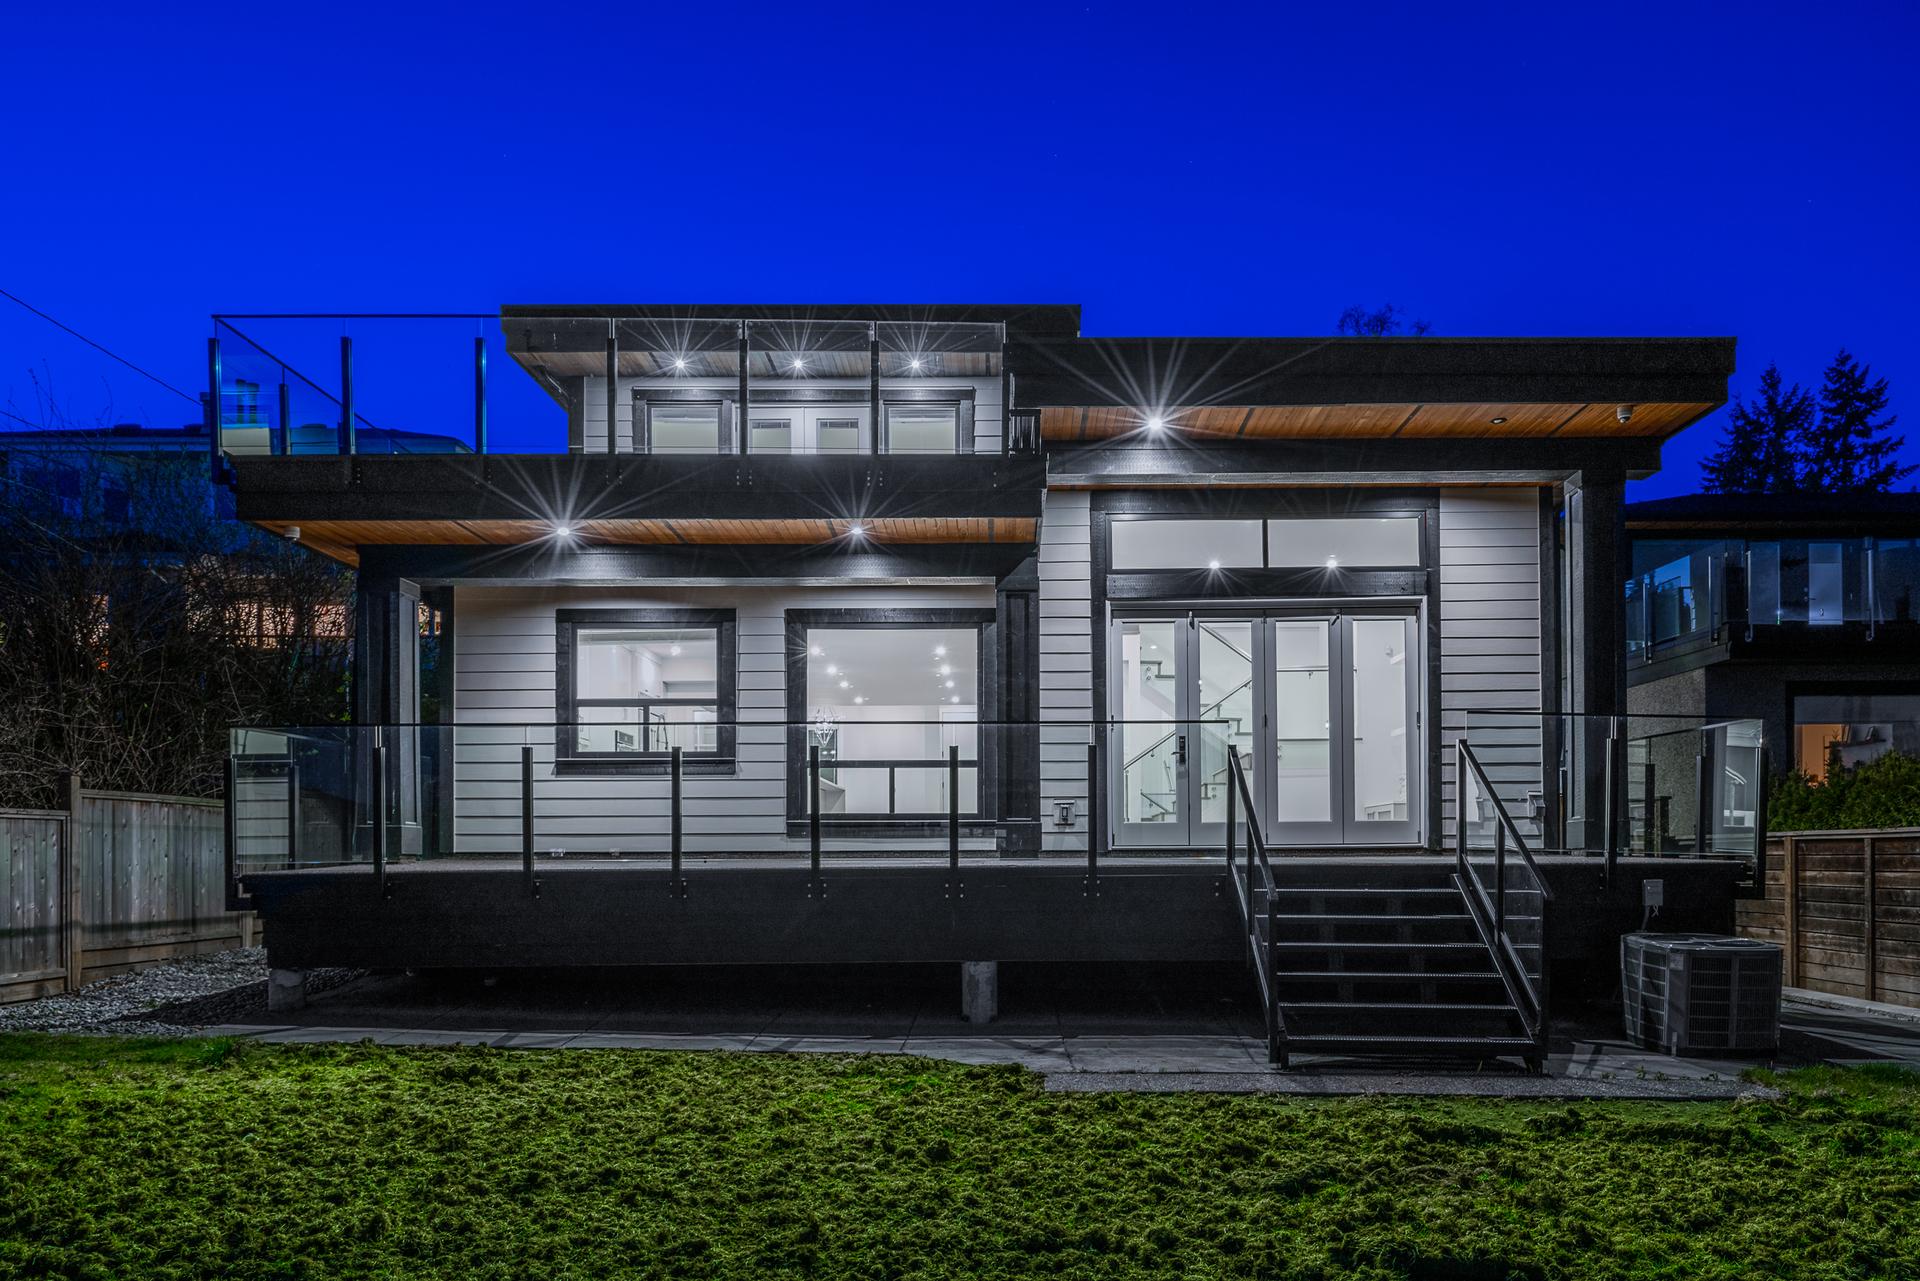 845-drayton-street-north-vancouver-6 at 845 Drayton Street, Calverhall, North Vancouver